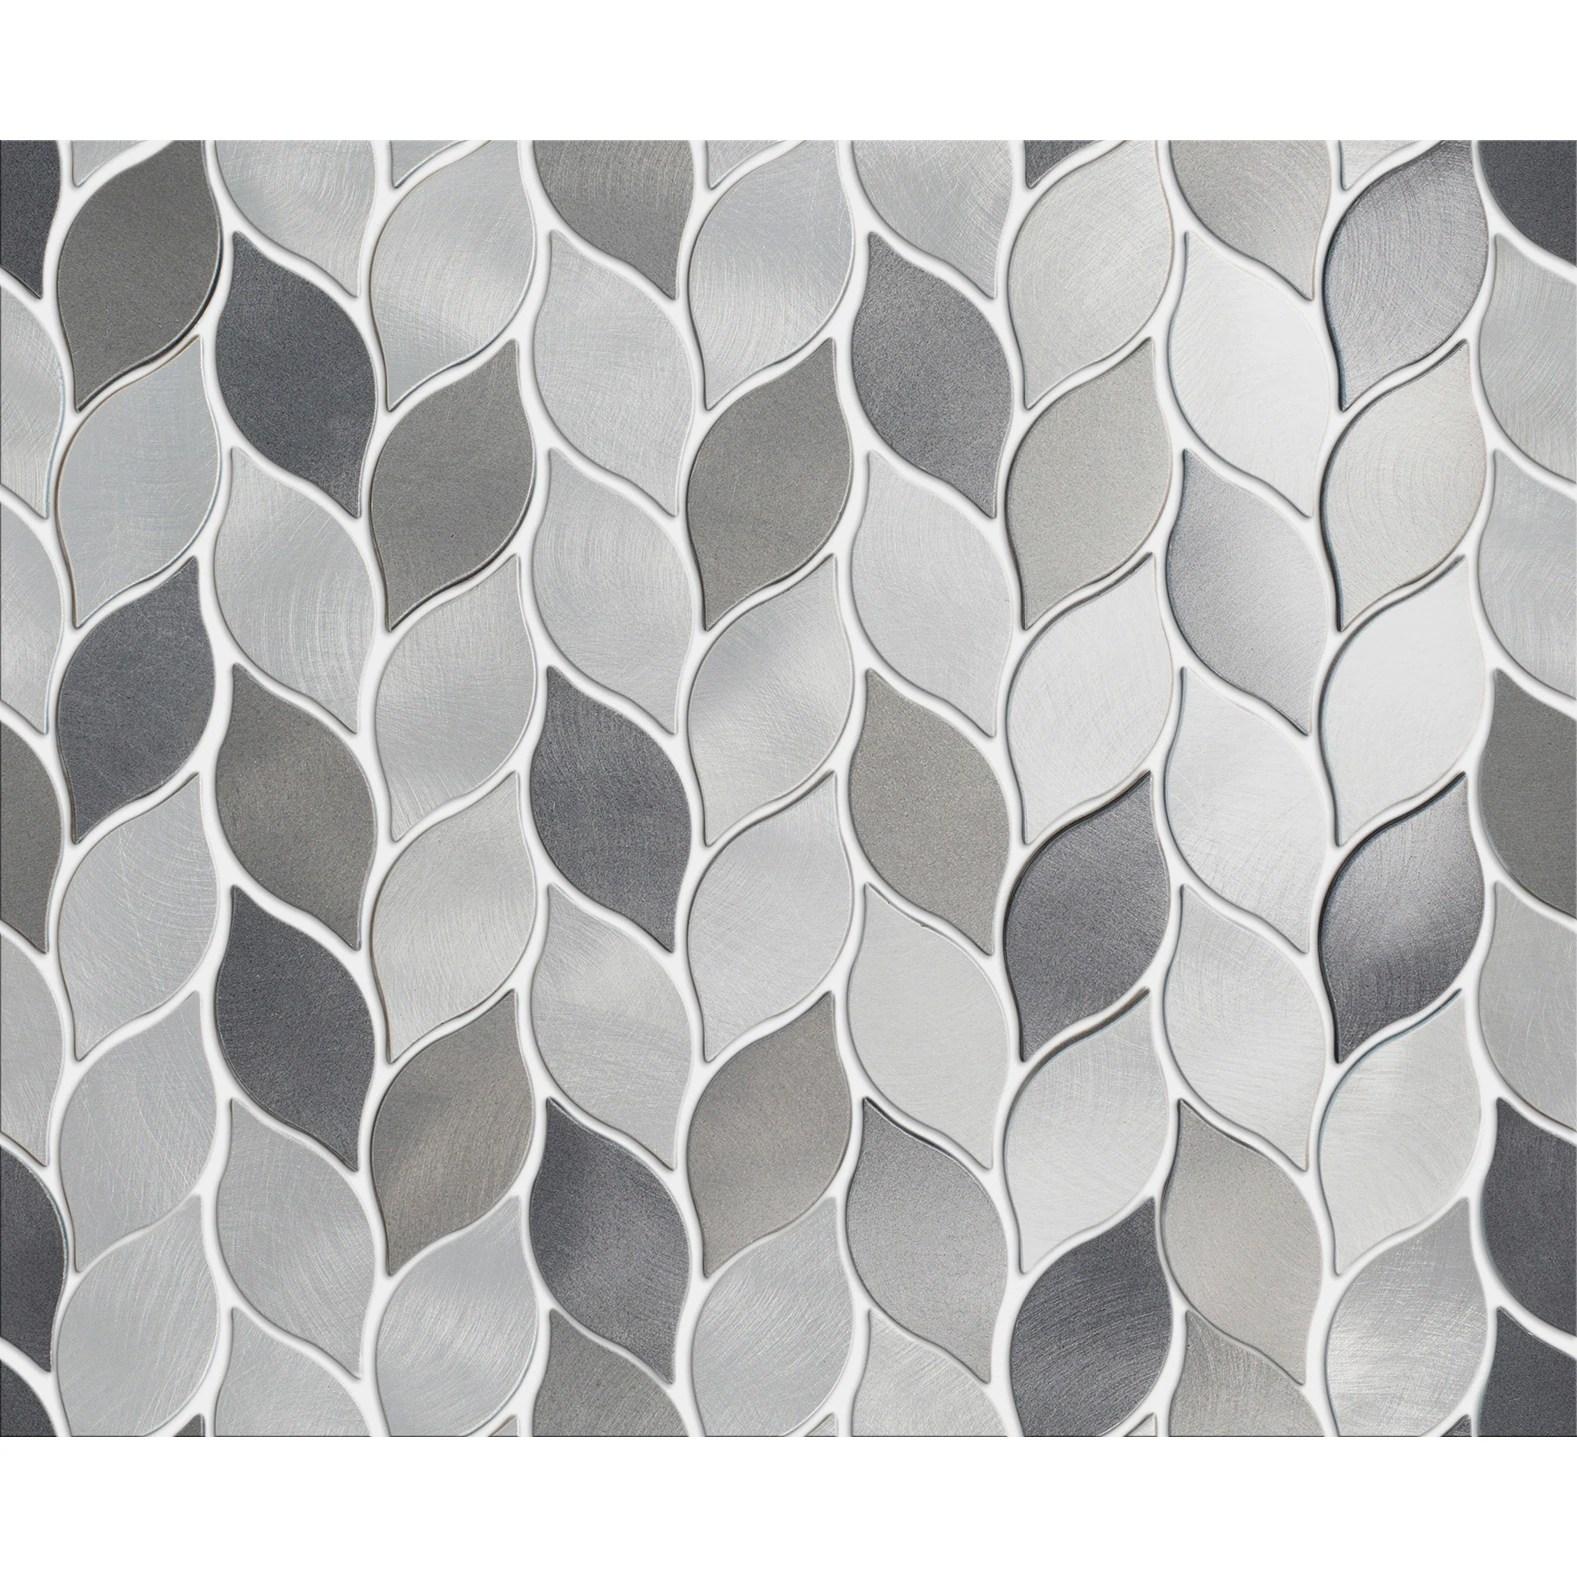 tilegen leaf shape 1 25 x 2 75 aluminum metal mosaic tile in silver gray wall tile 10 sheets 11sqft